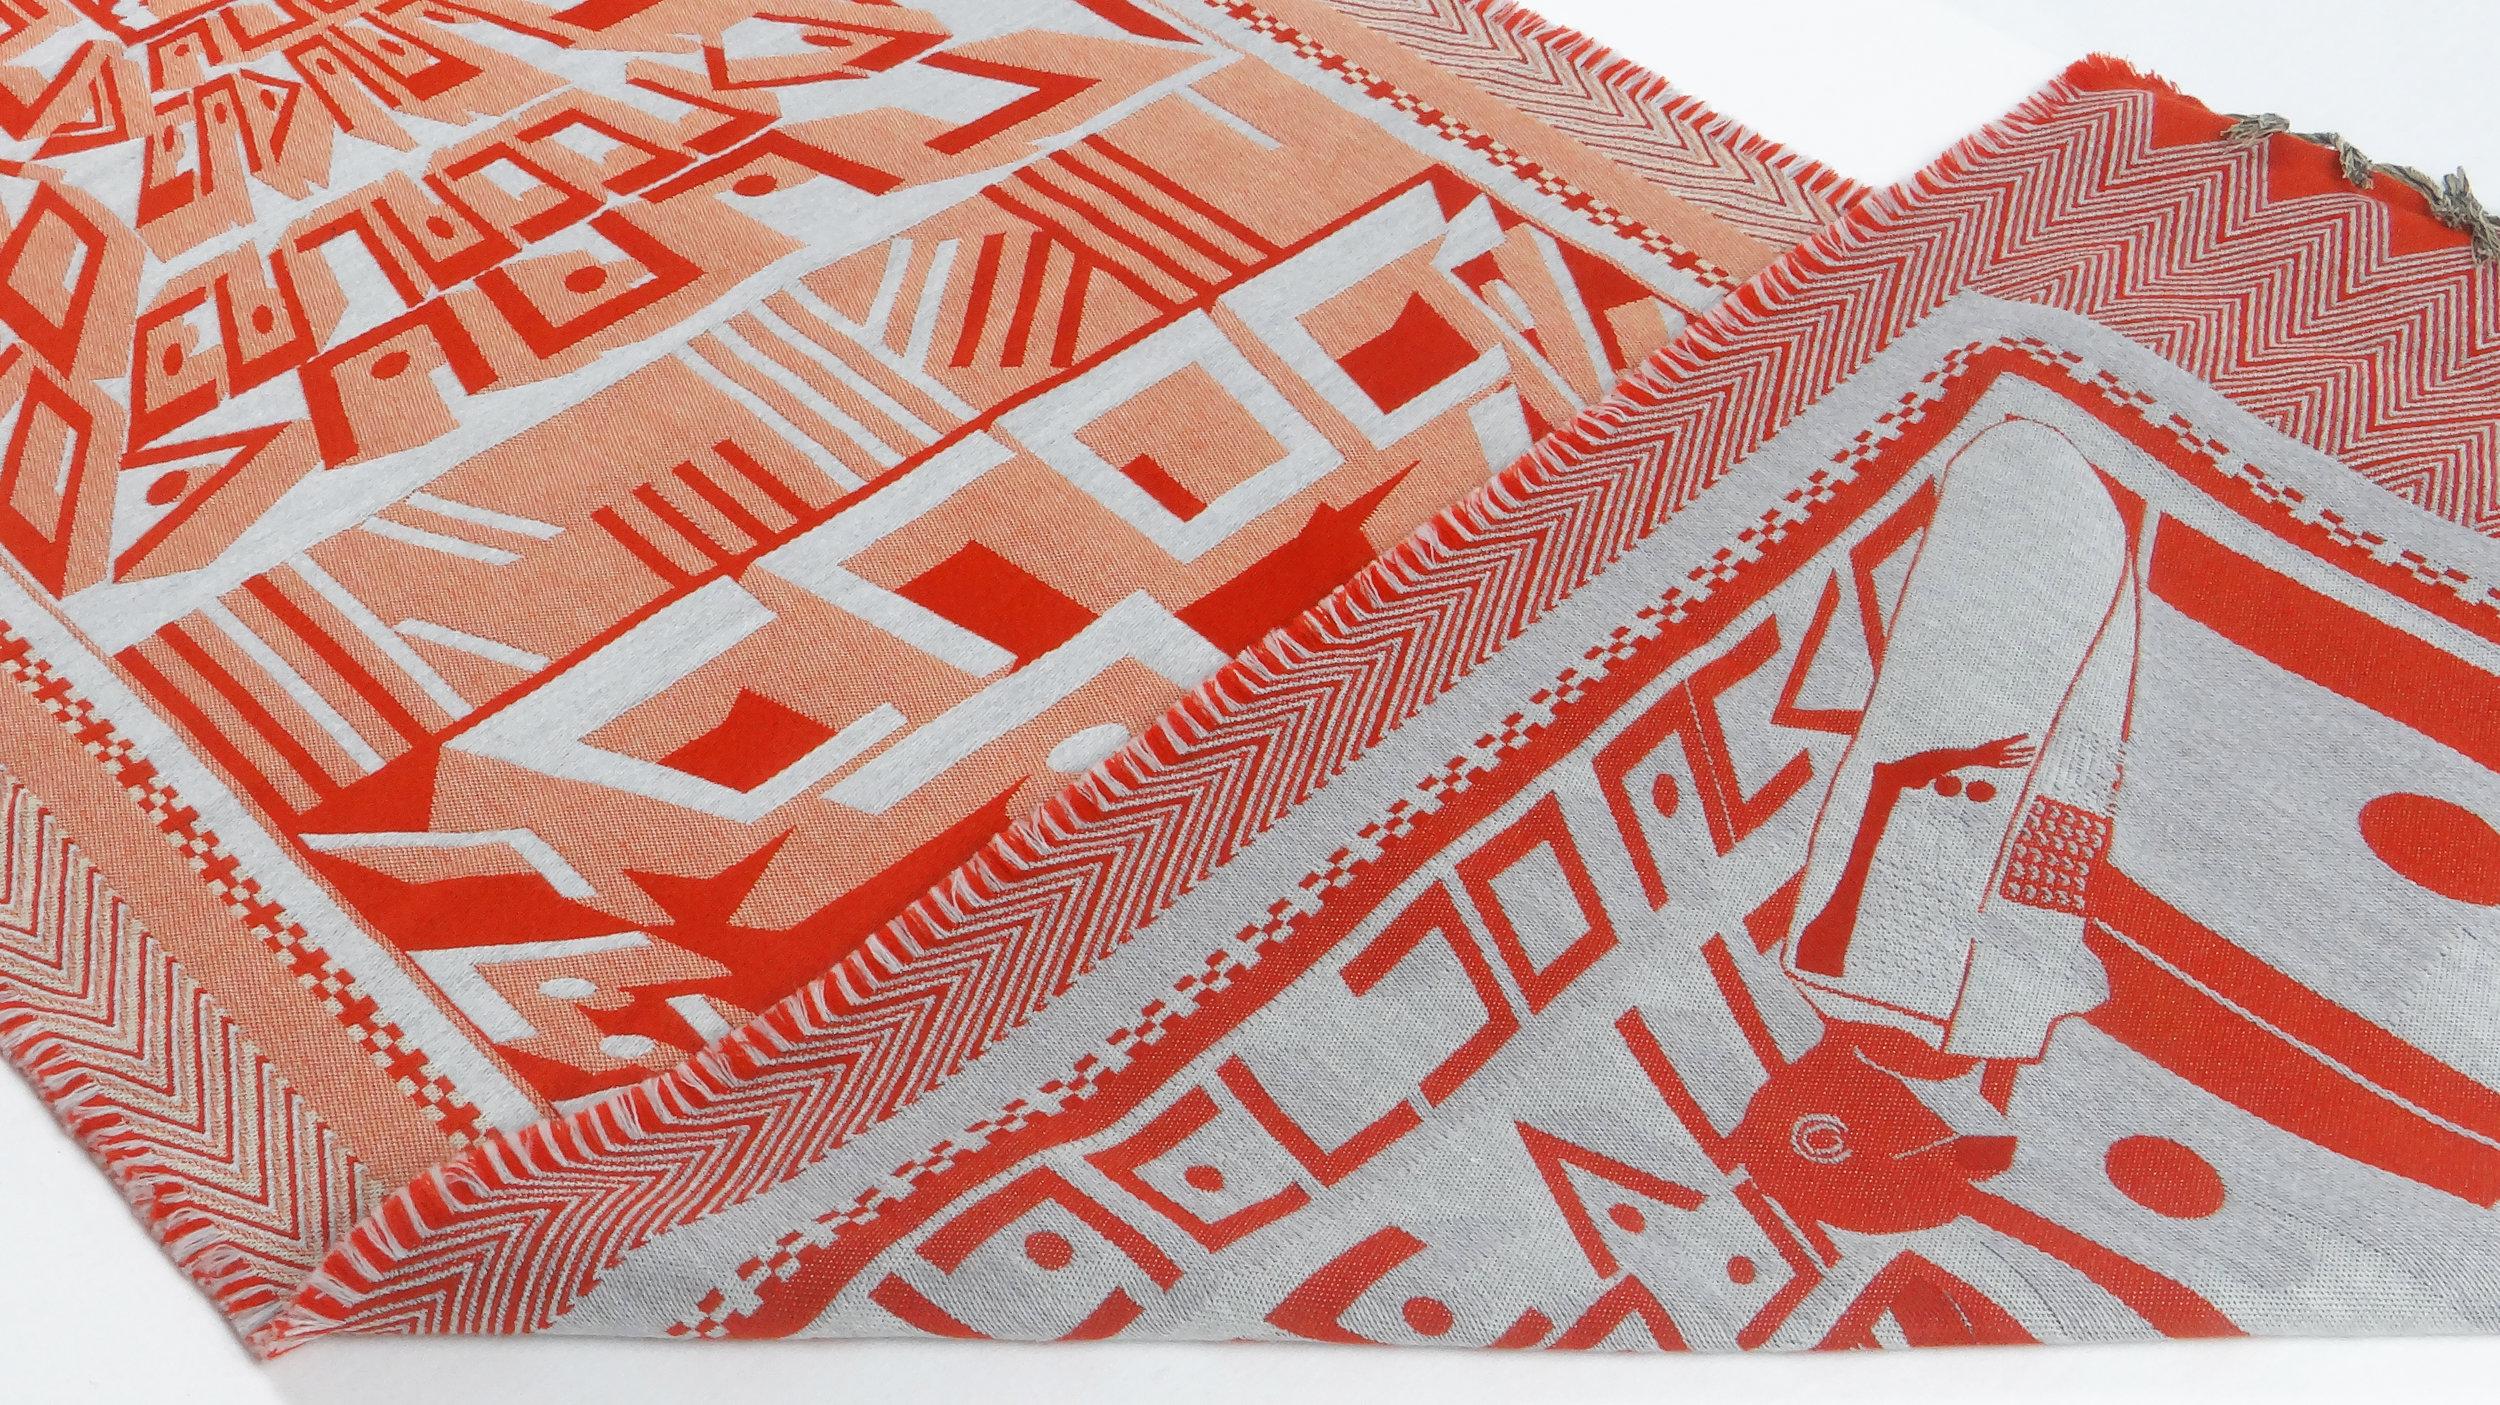 D/P/H Blanket - Concrete Henna